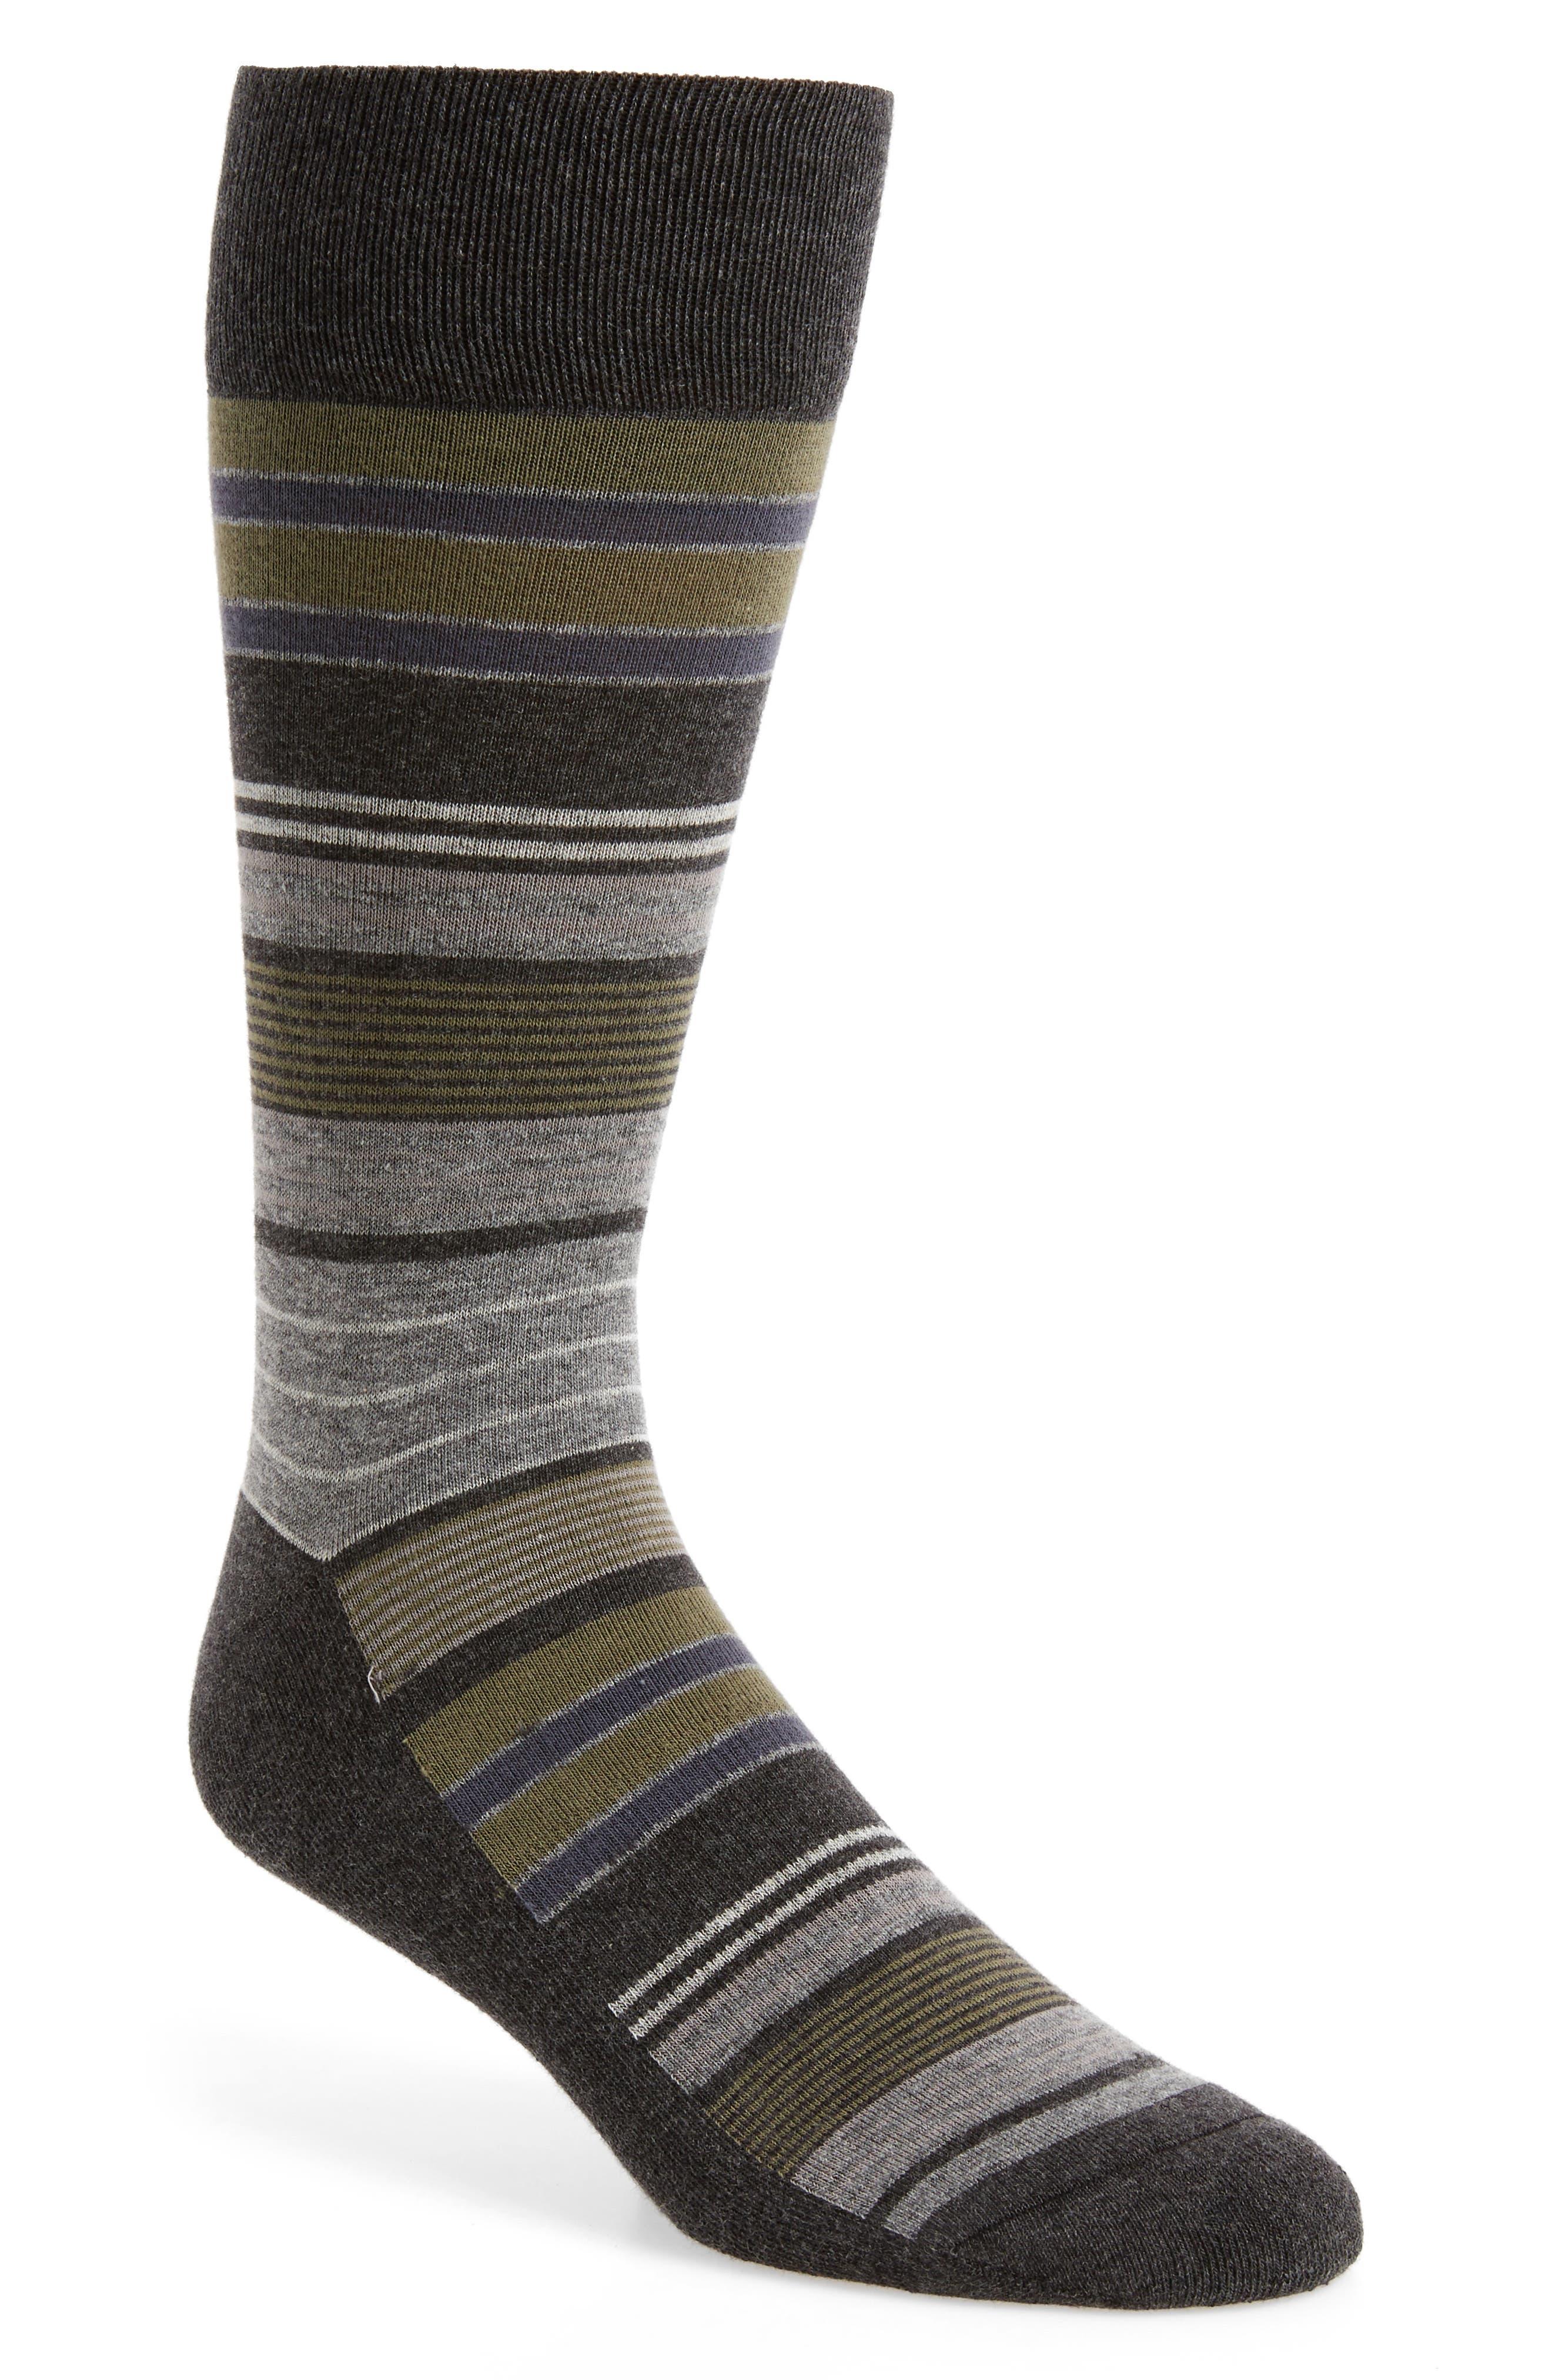 Random Stripe Socks,                         Main,                         color, Charcoal Heather